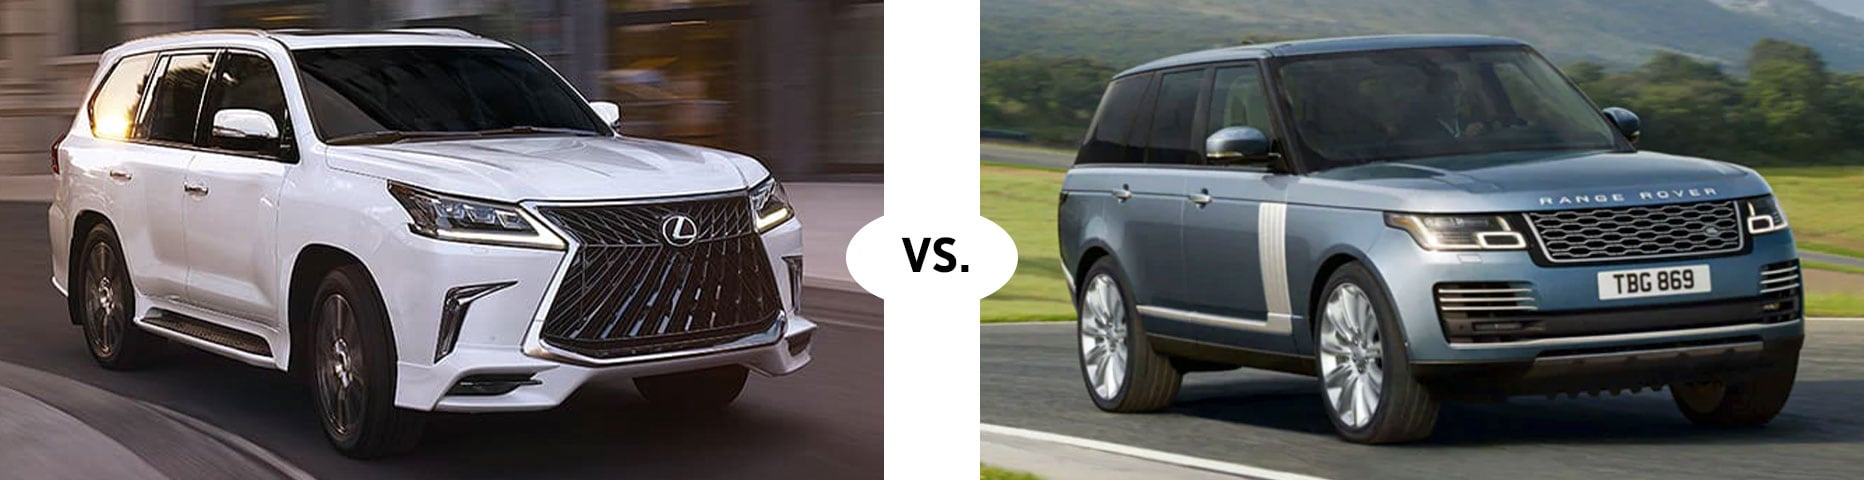 Range Rover Gwinnett >> Lexus vs. Land Rover Comparison | Hennessy Lexus Gwinnett